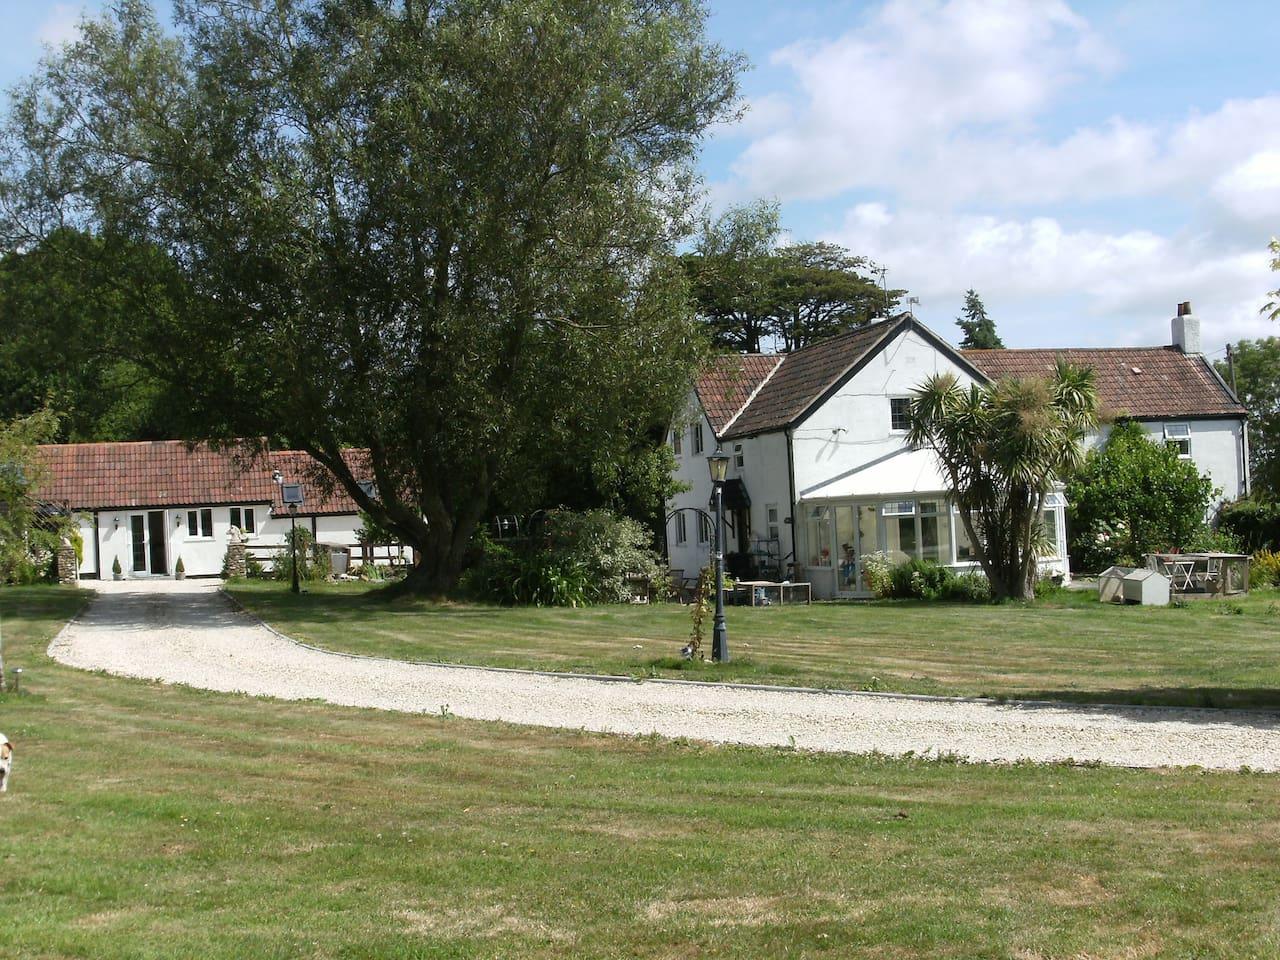 House & Annexe